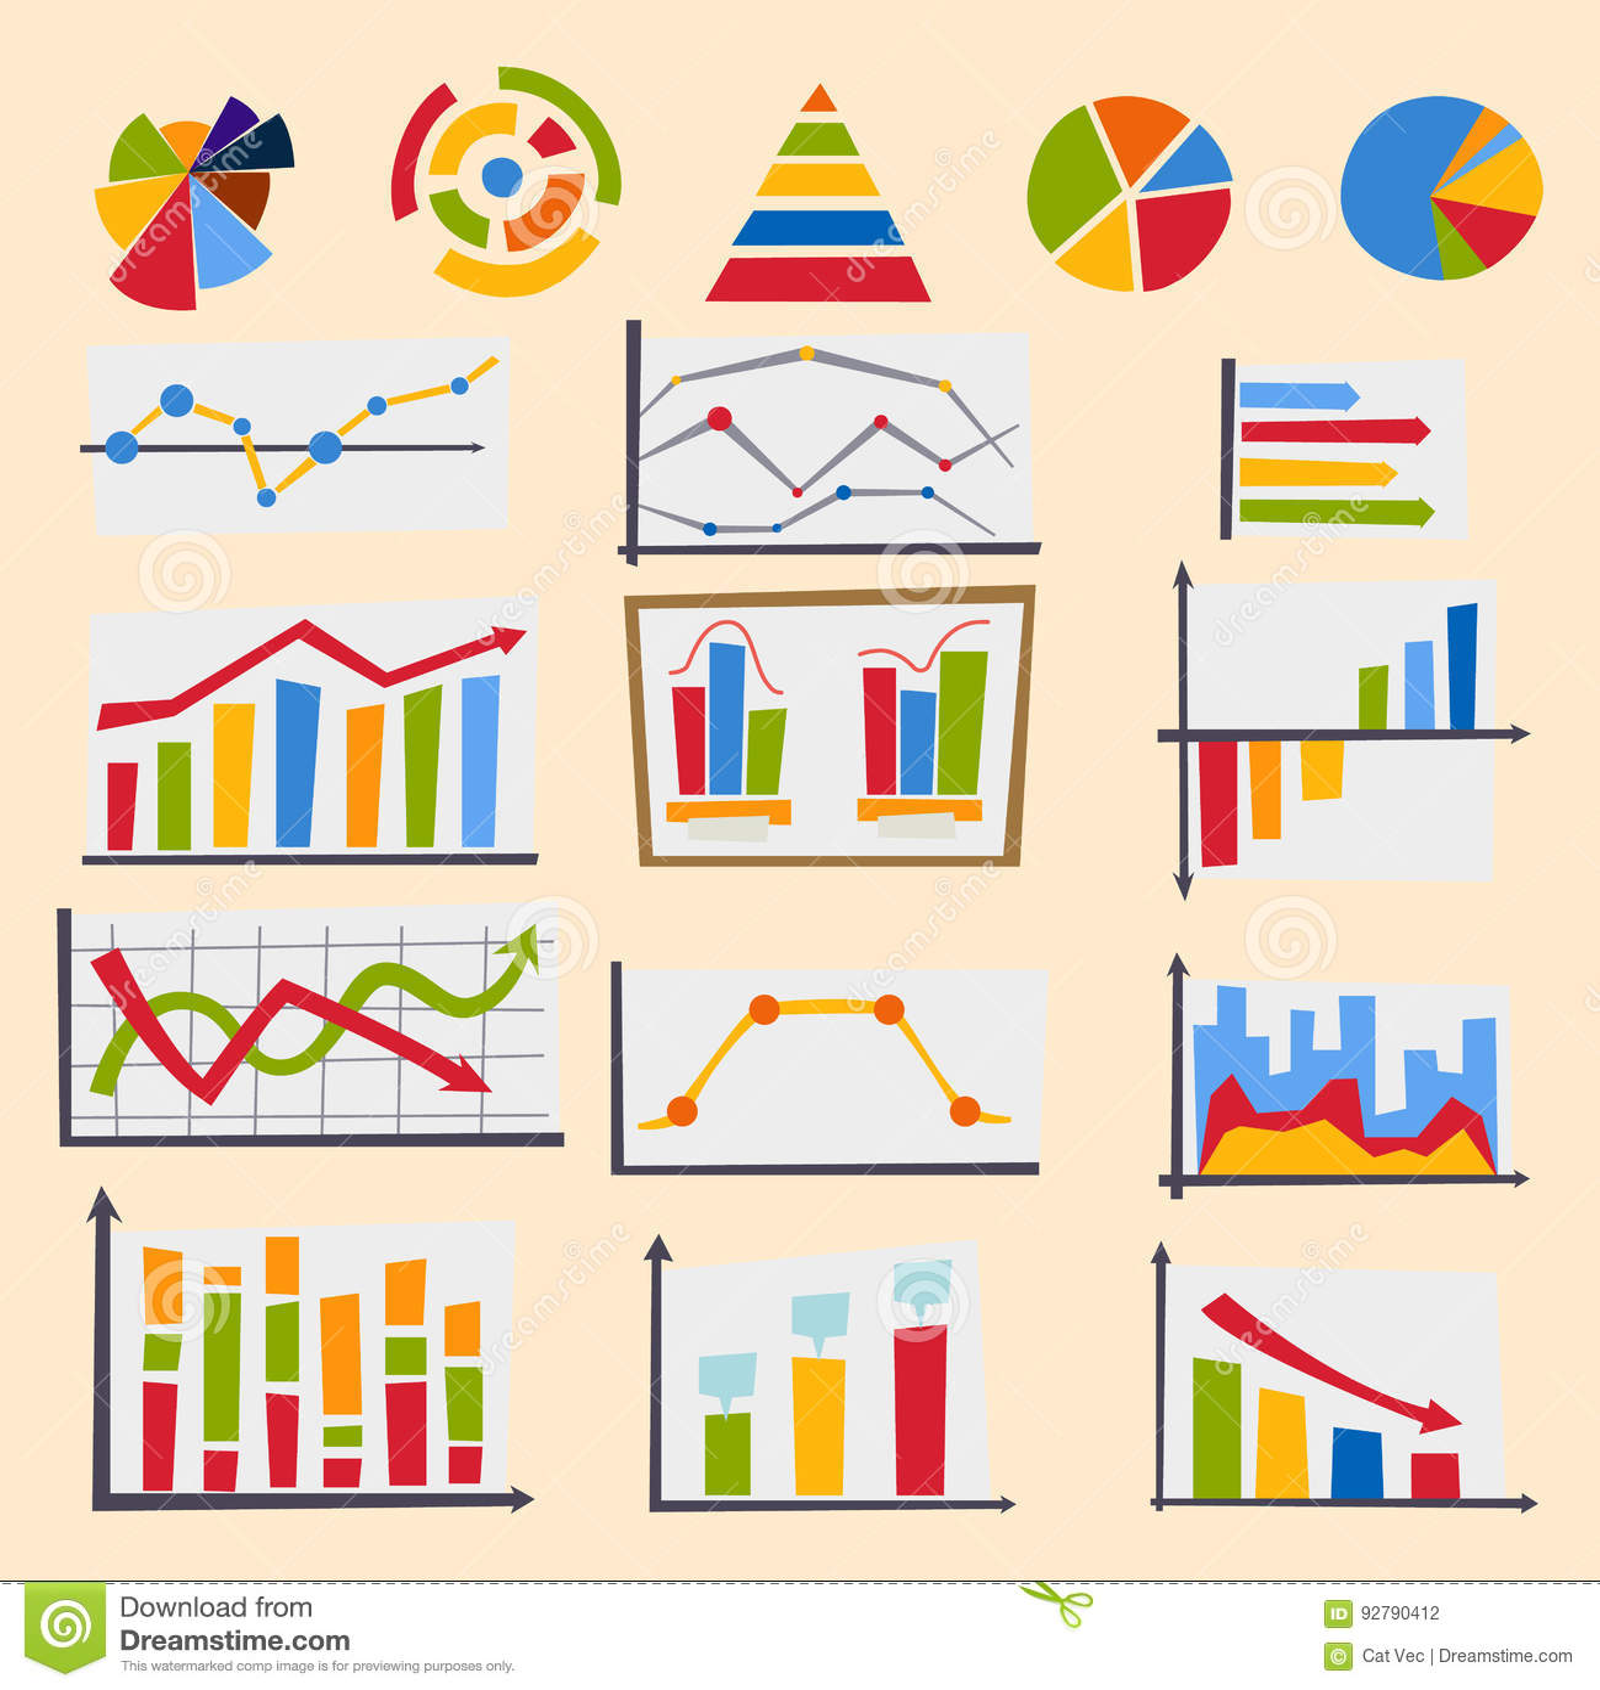 Design diagram chart elements vector illustration of business flow sheet graph infographics data template